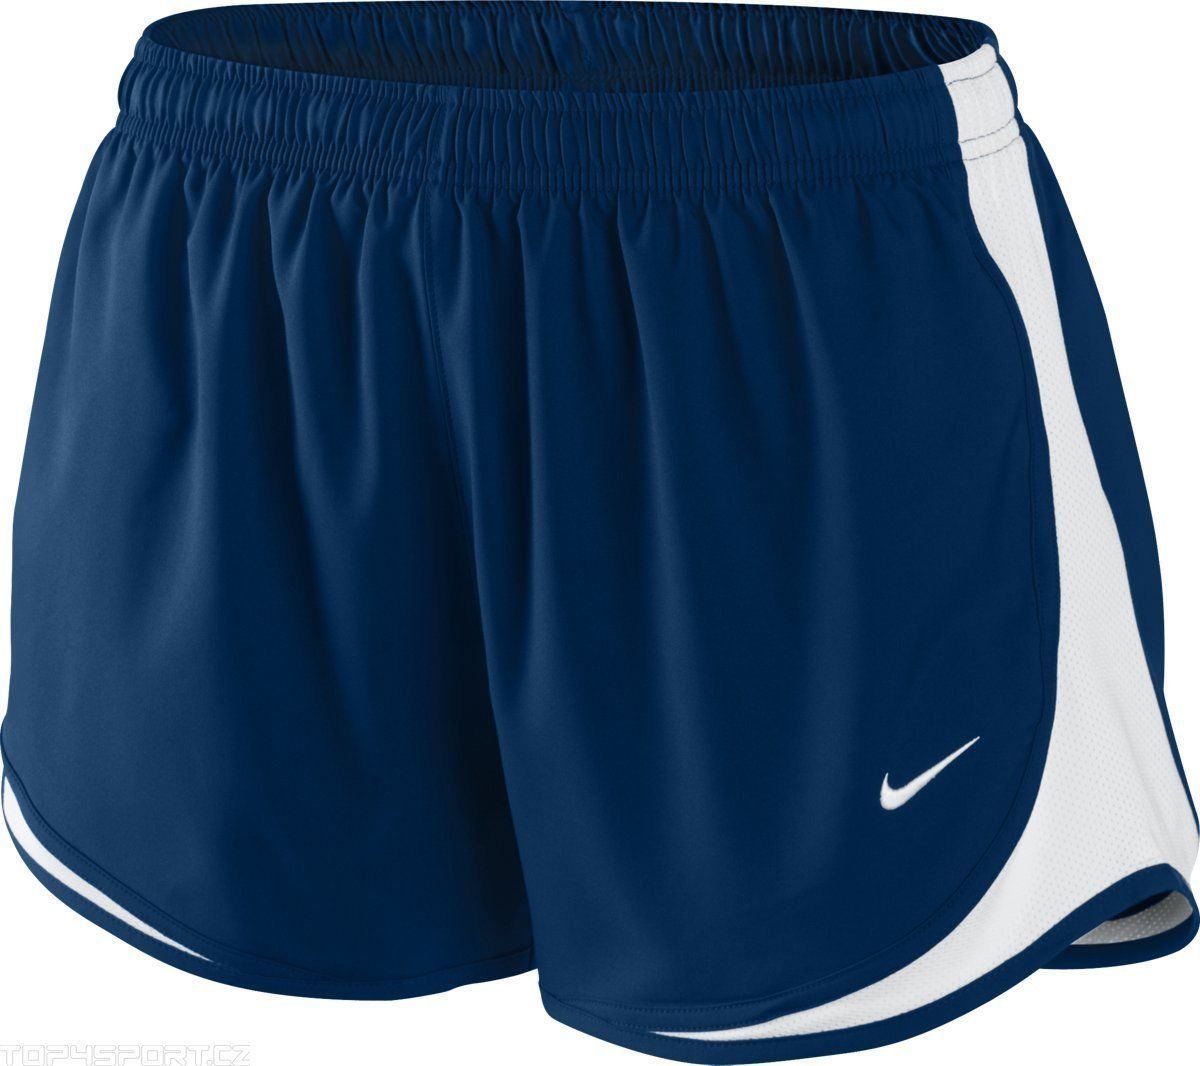 "Nike Navy Blue Original Tempo DriFit Women's 3"" Running"